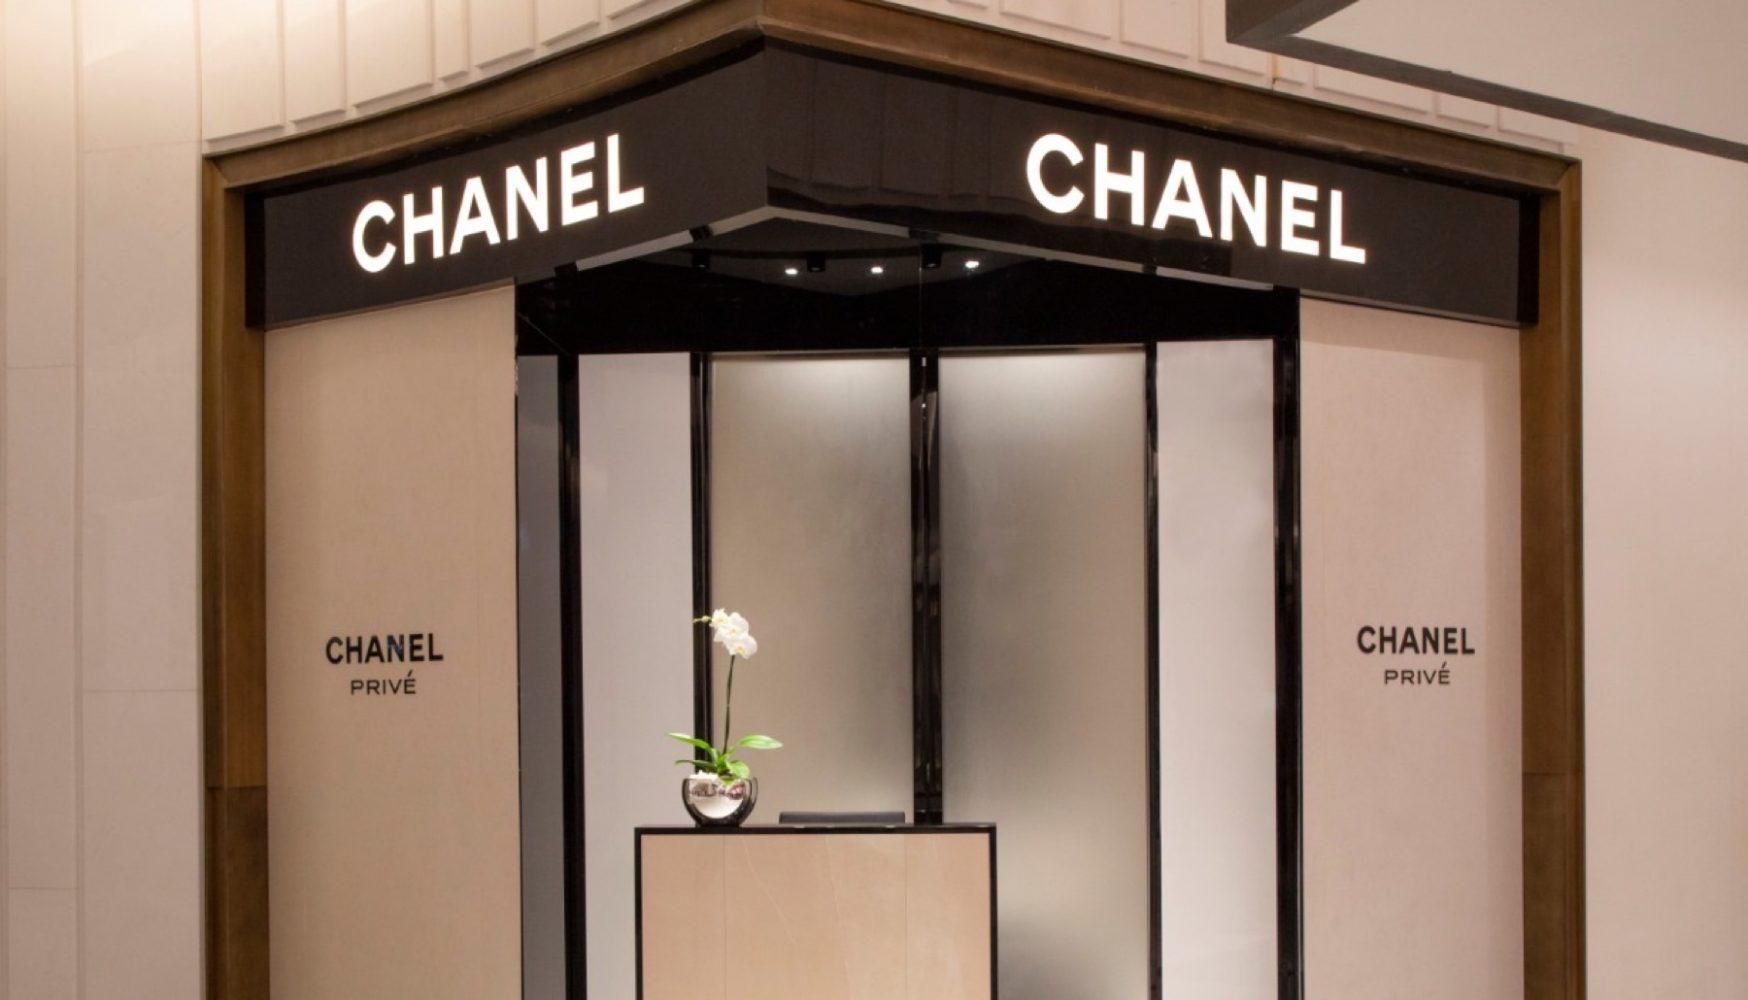 Chanel Privé